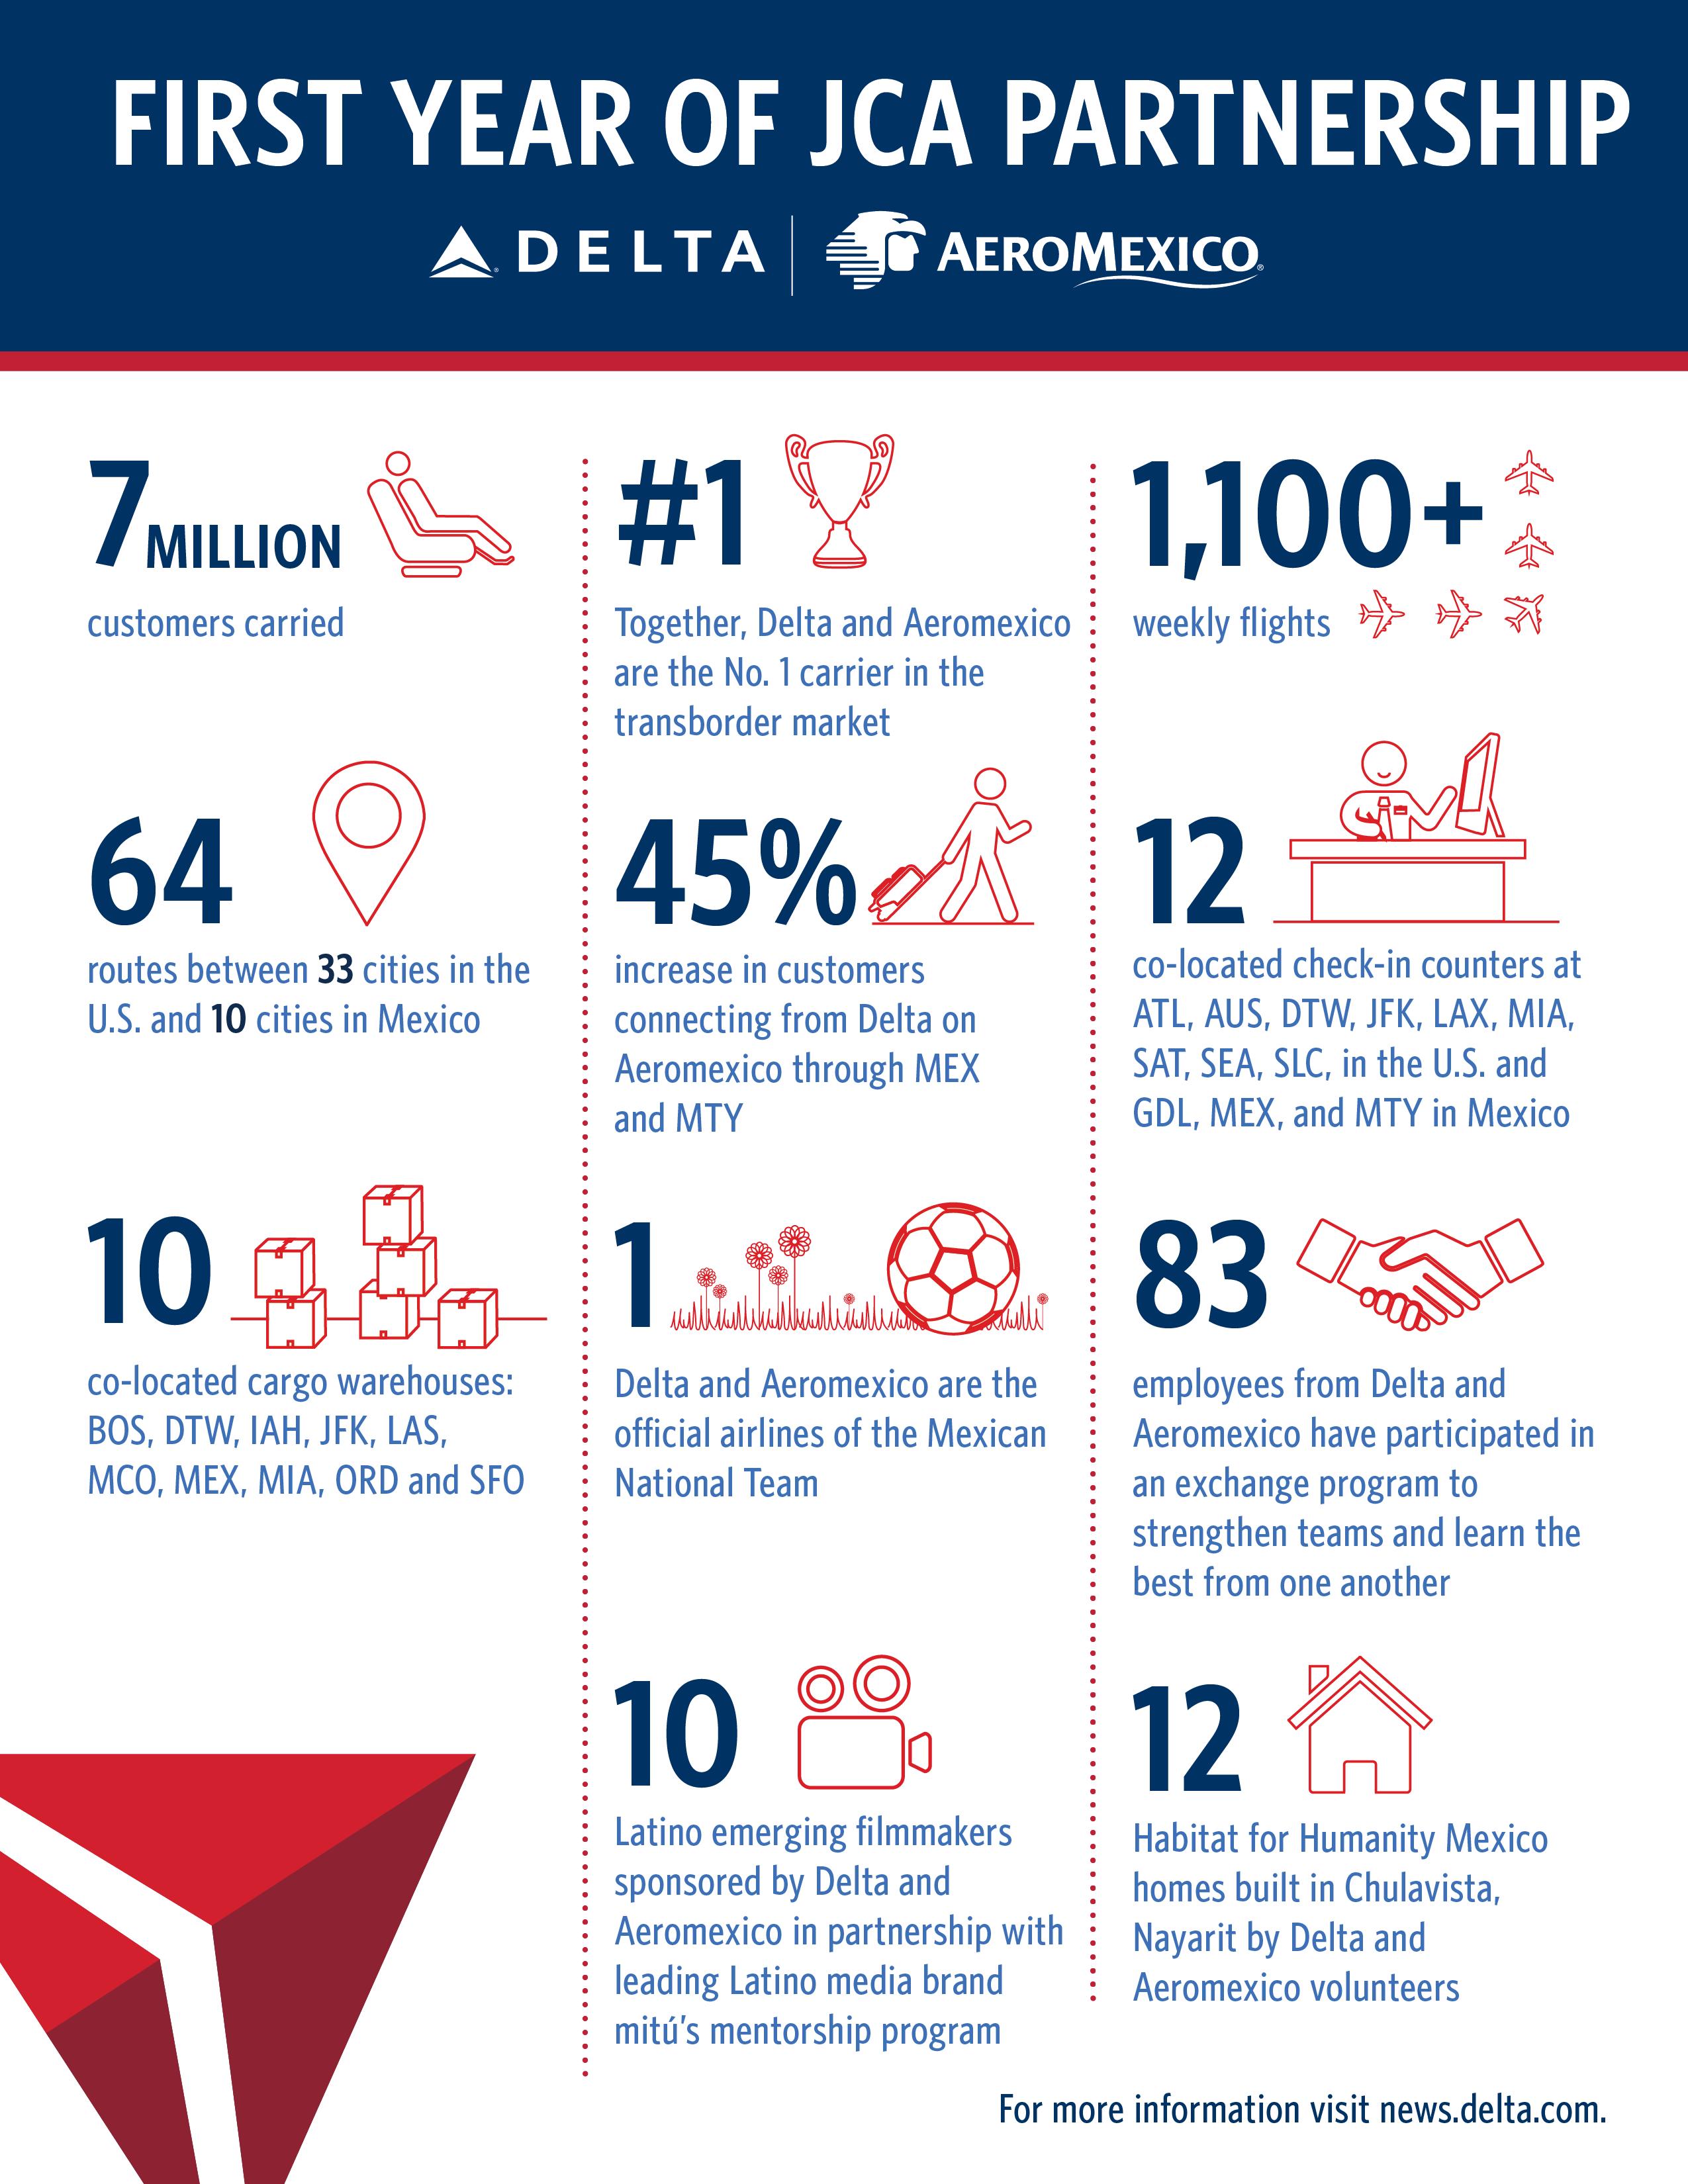 Delta Aeromexico JCA 1 Year Anniversary